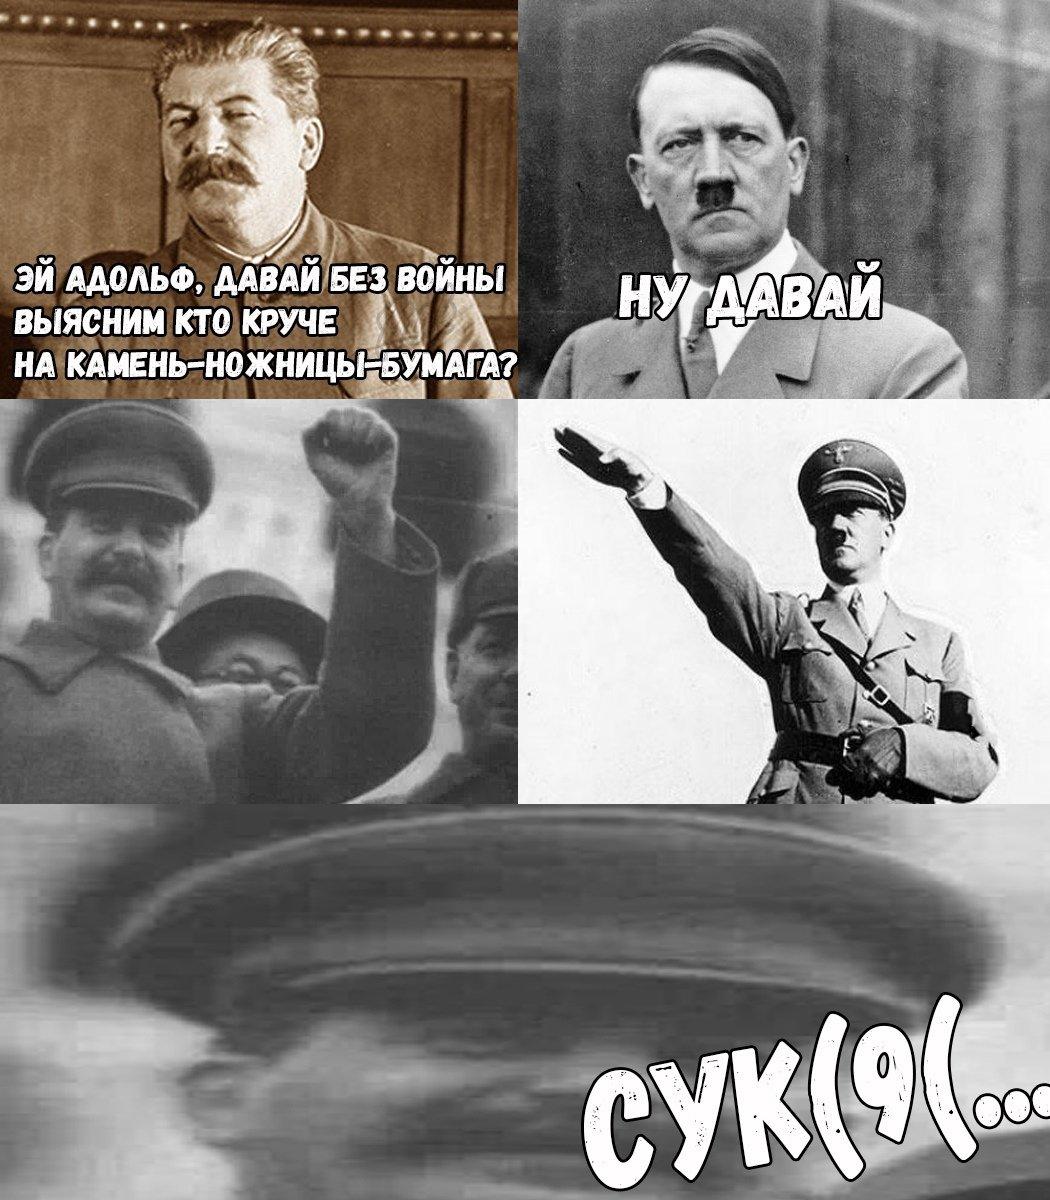 Демотиваторы гитлер и сталин